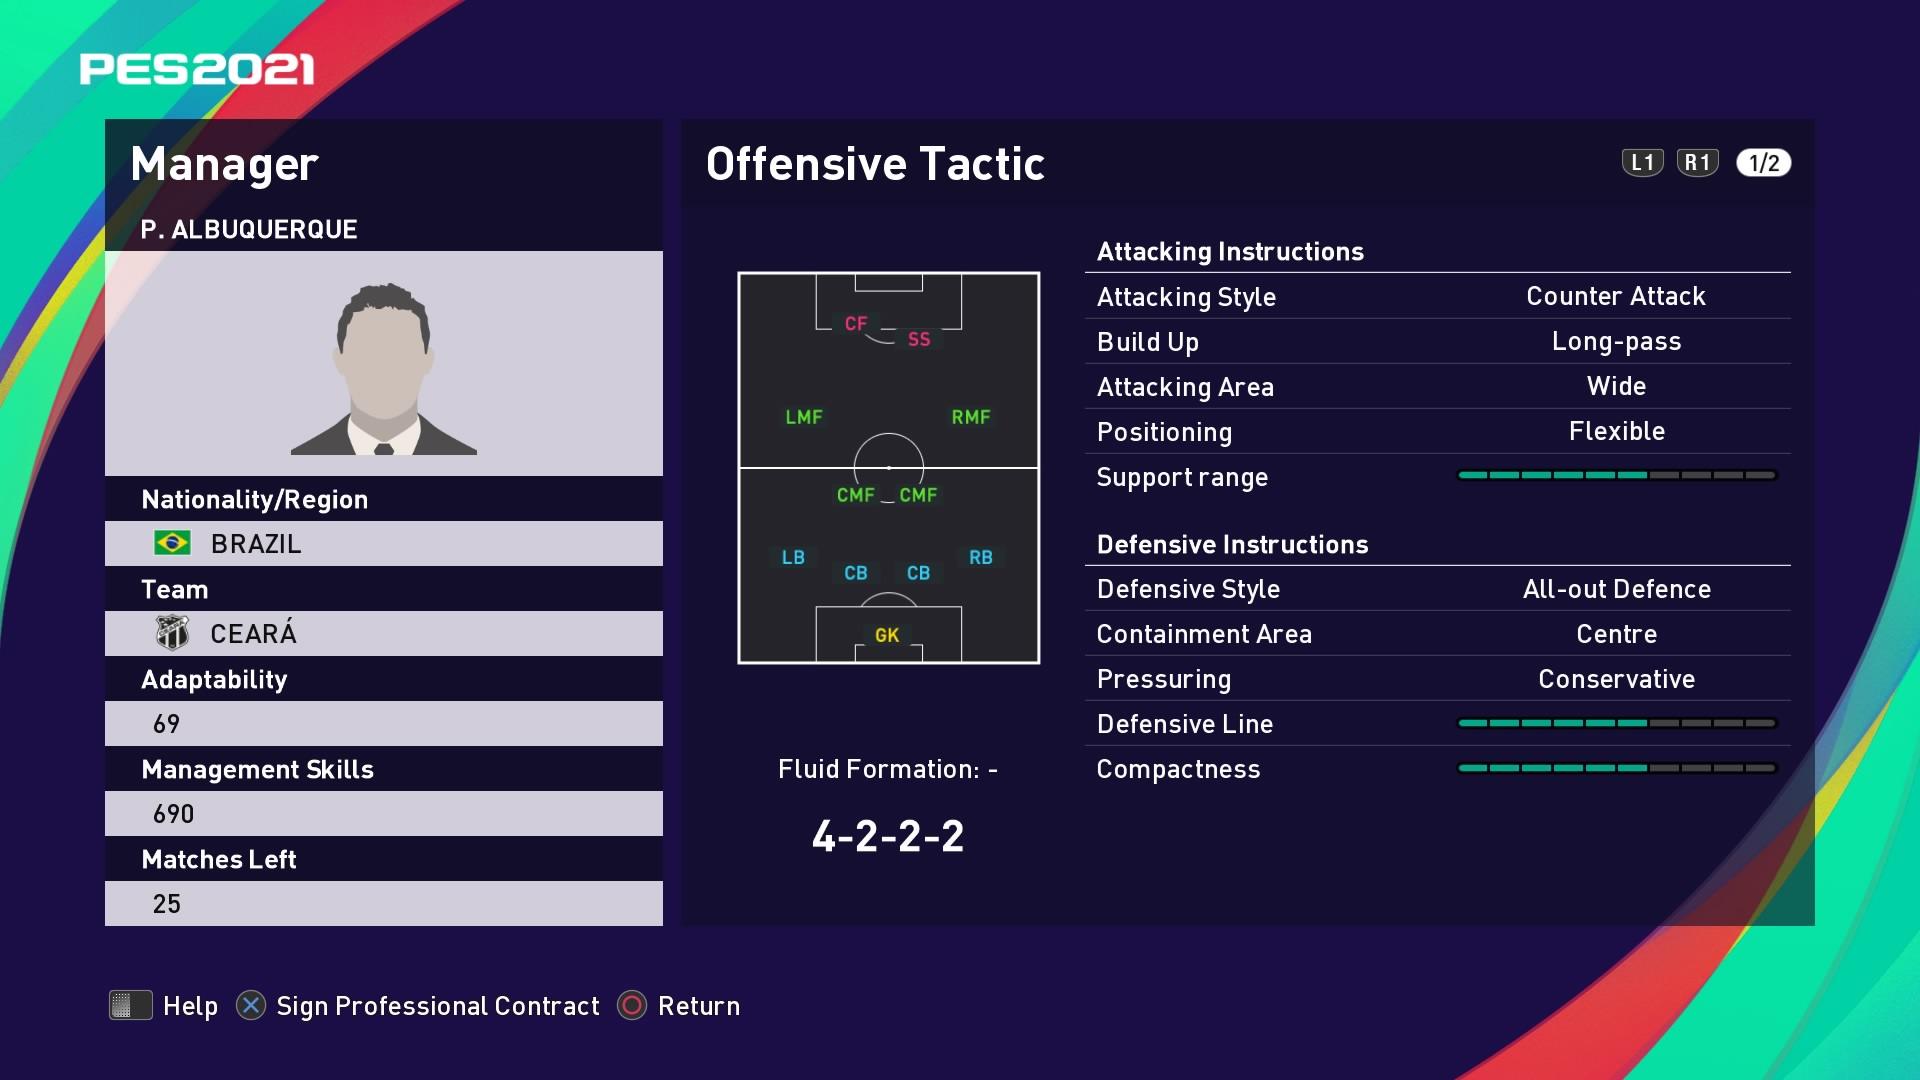 P. Albuquerque (Guto Ferreira) Offensive Tactic in PES 2021 myClub